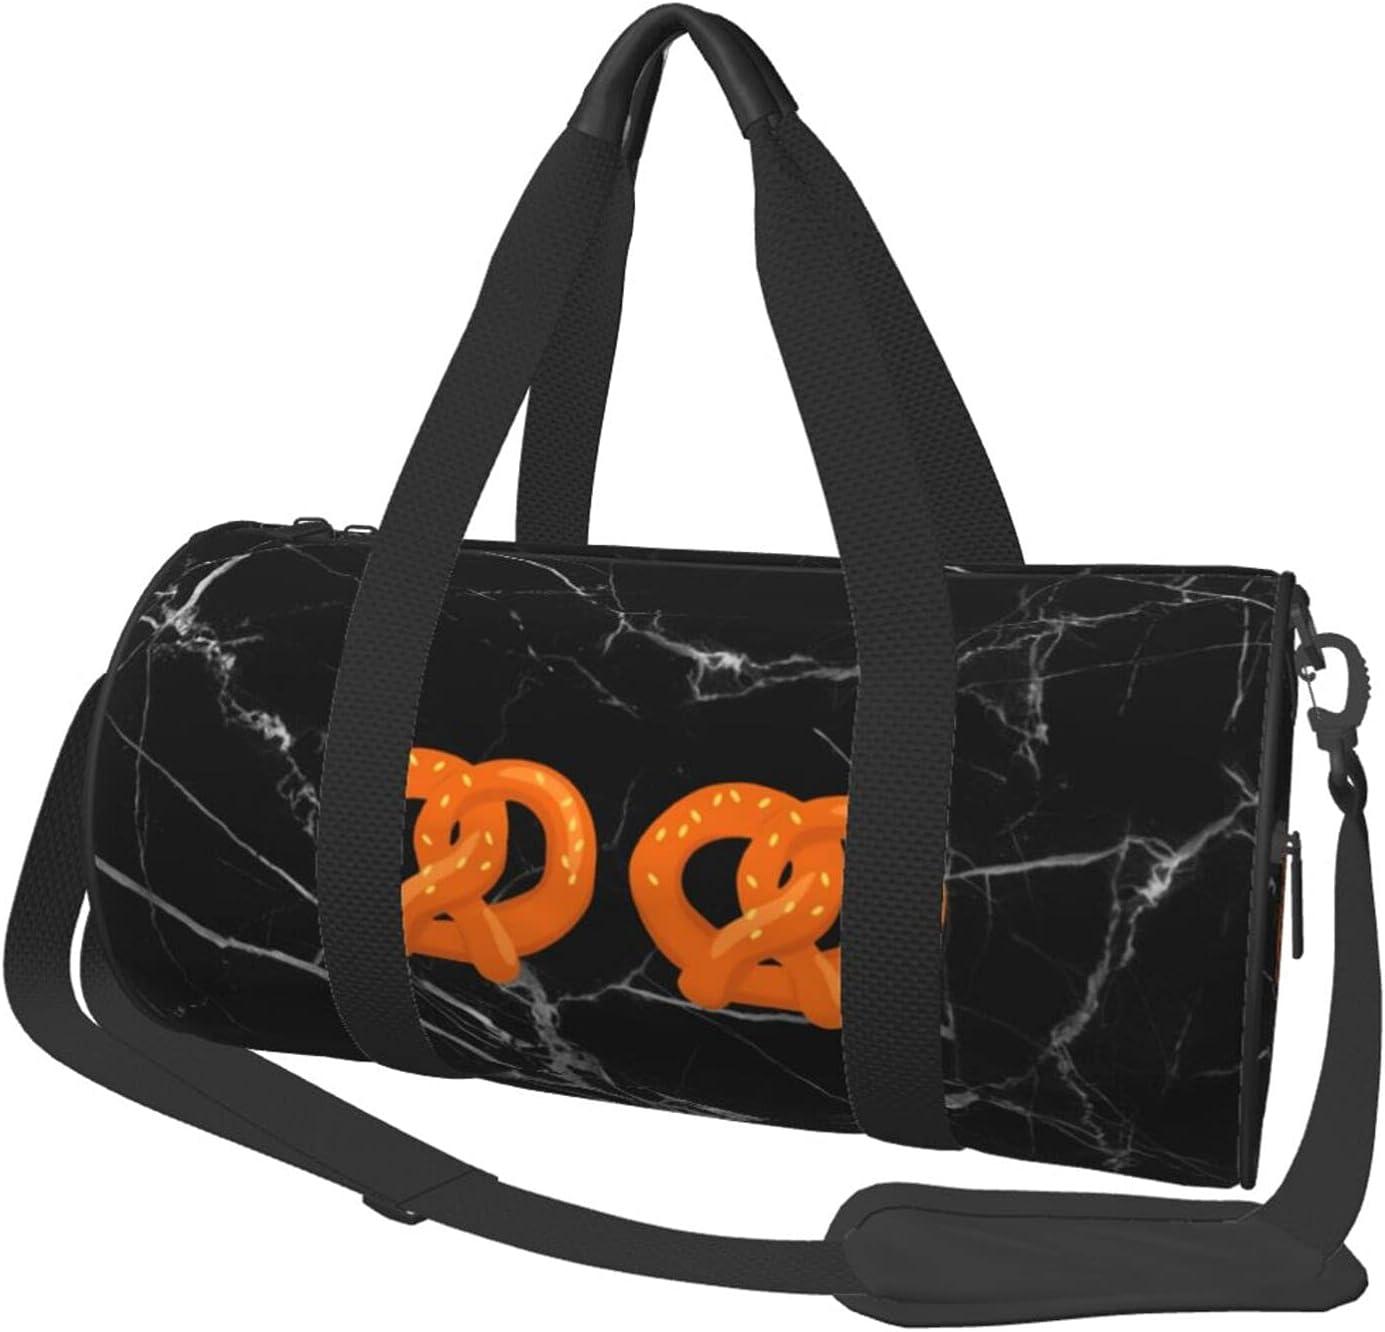 Sports Pretzel Bikini Funny 4 years warranty Halloween Bags Dealing full price reduction Travel Gym Duffle Bag